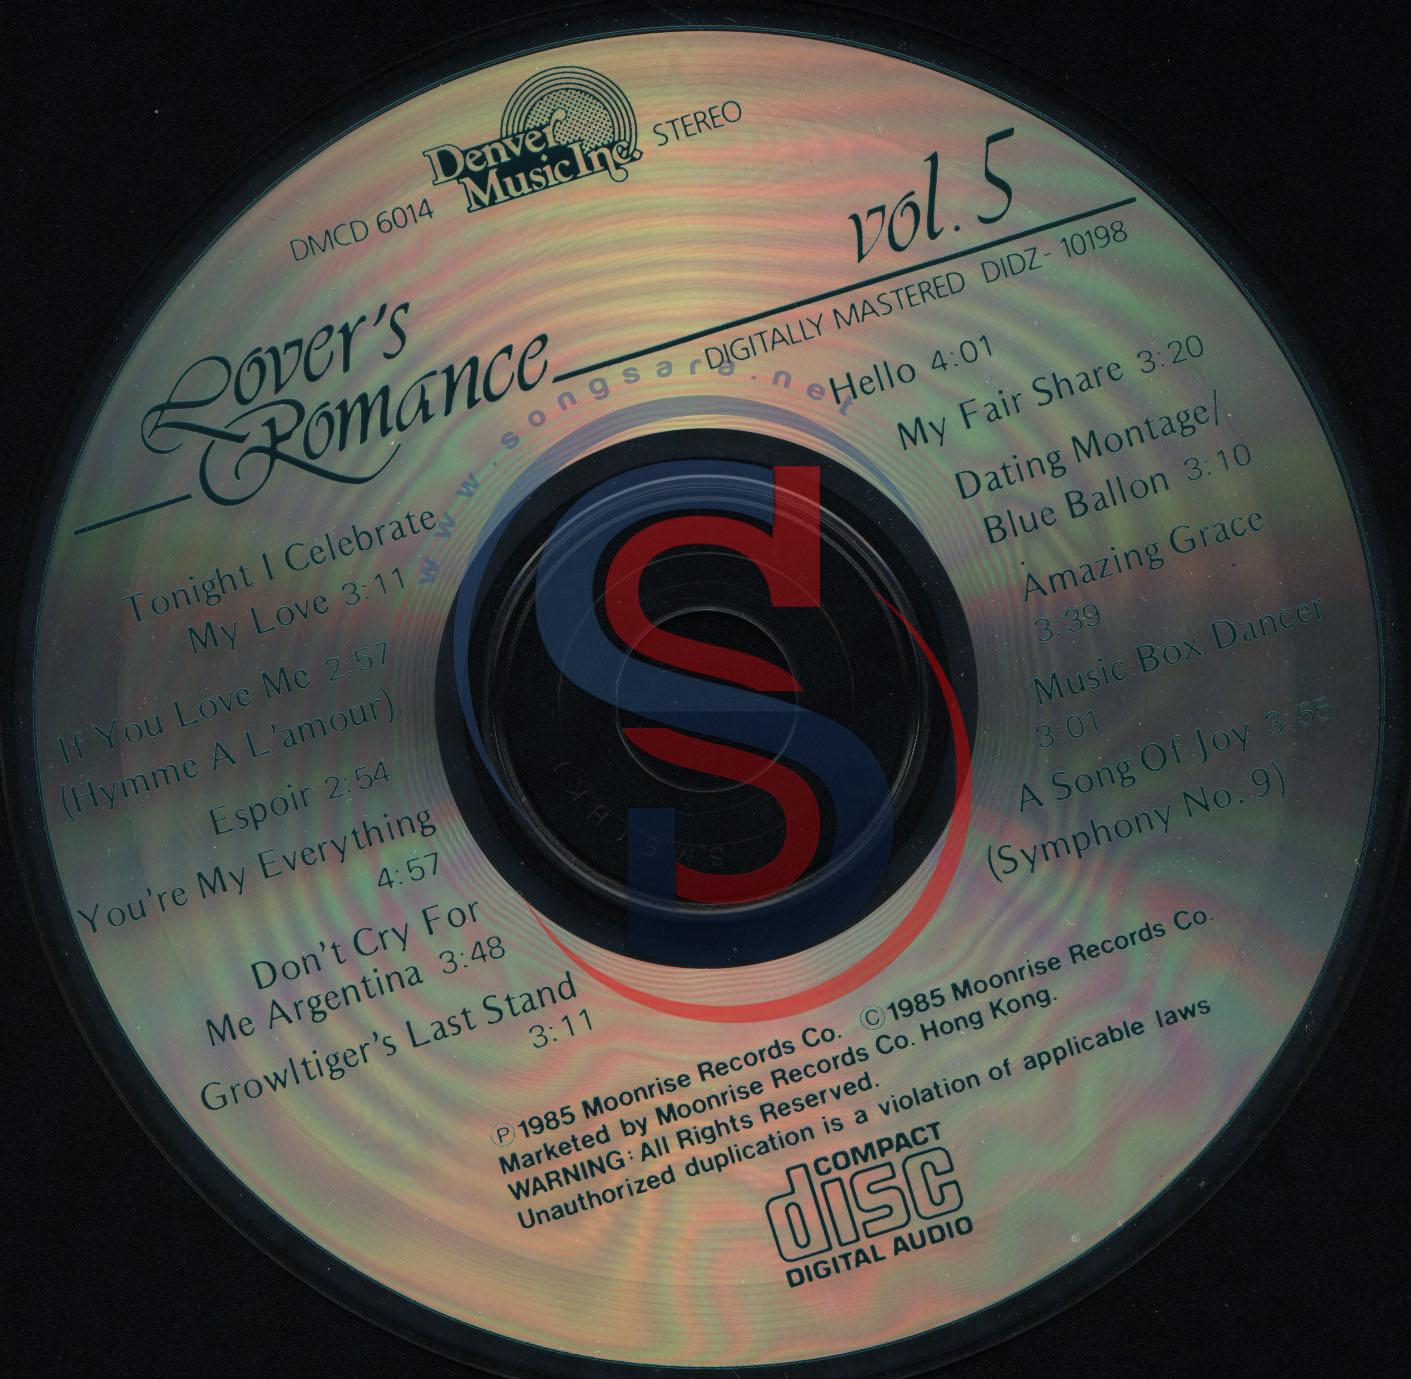 http://dl.songsara.net/instrumental/Album/Lover%27s%20Romance%20Vol.05%20(You%27re%20My%20Everything)/CD.jpg